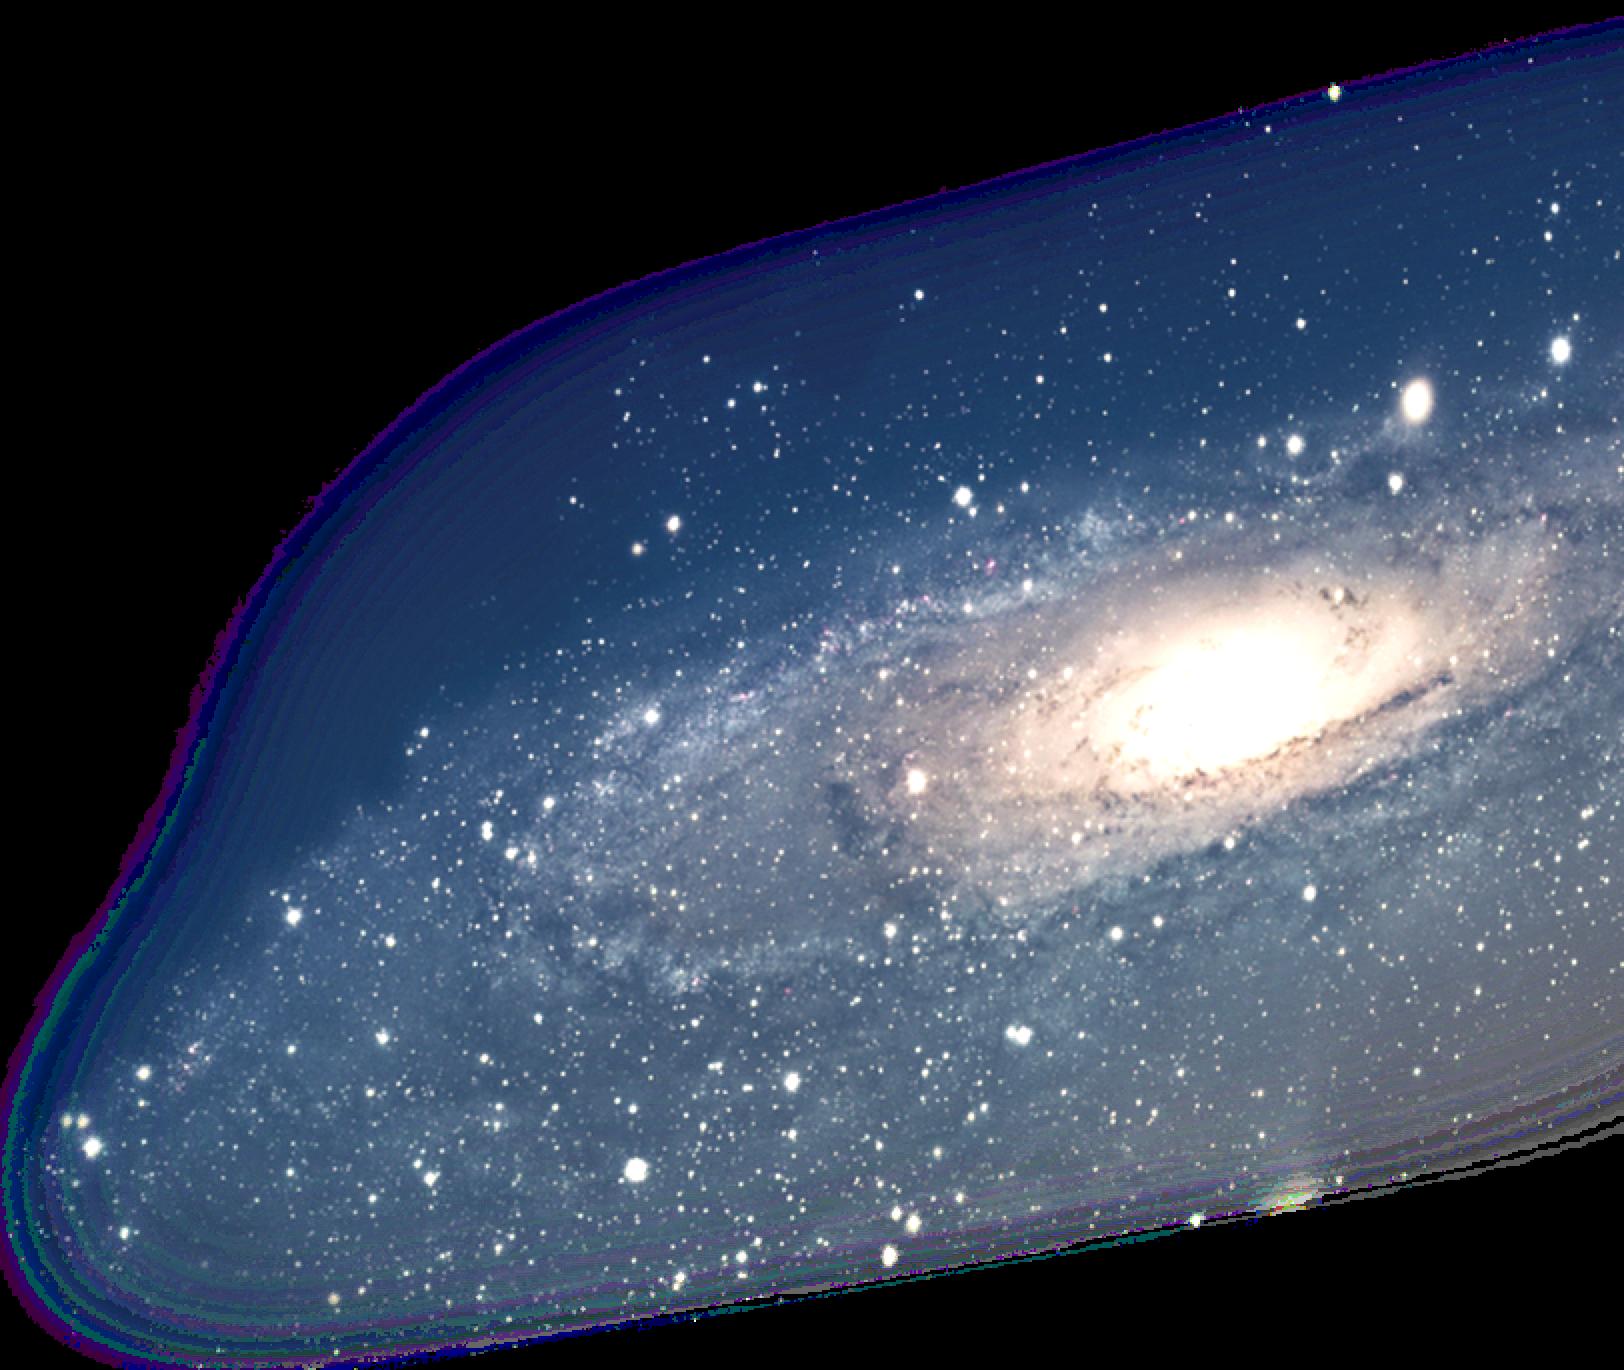 star space transparent - HD1624×1370